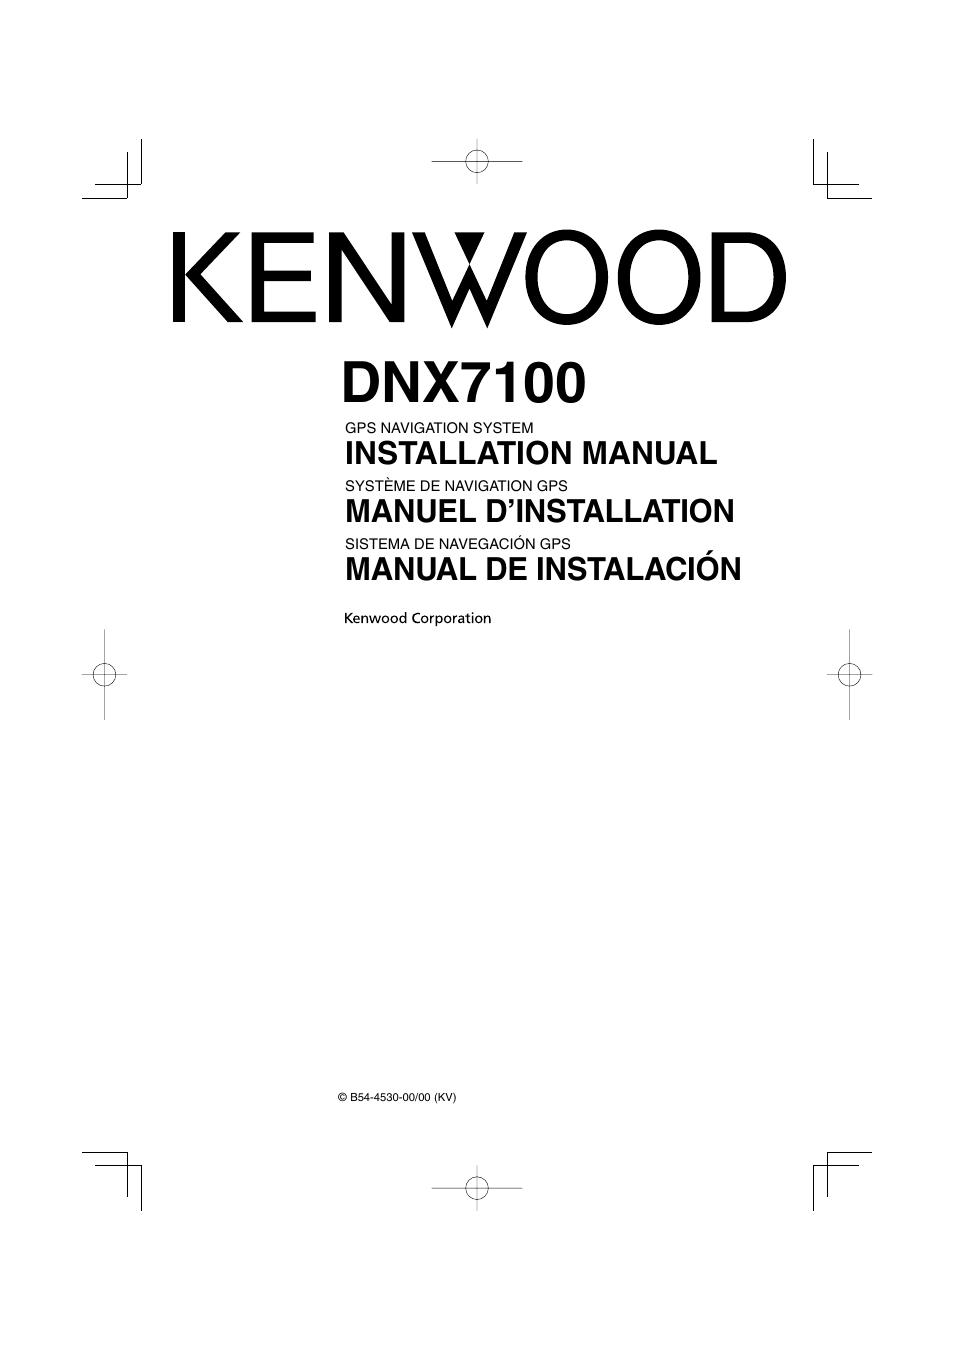 Https Post Kenwood User Manuals 2018 11 29t224320 1999 Volkswagen Beetle Engine Diagram Http Wwwjimellisvwpartscom Dnx7100 Page1